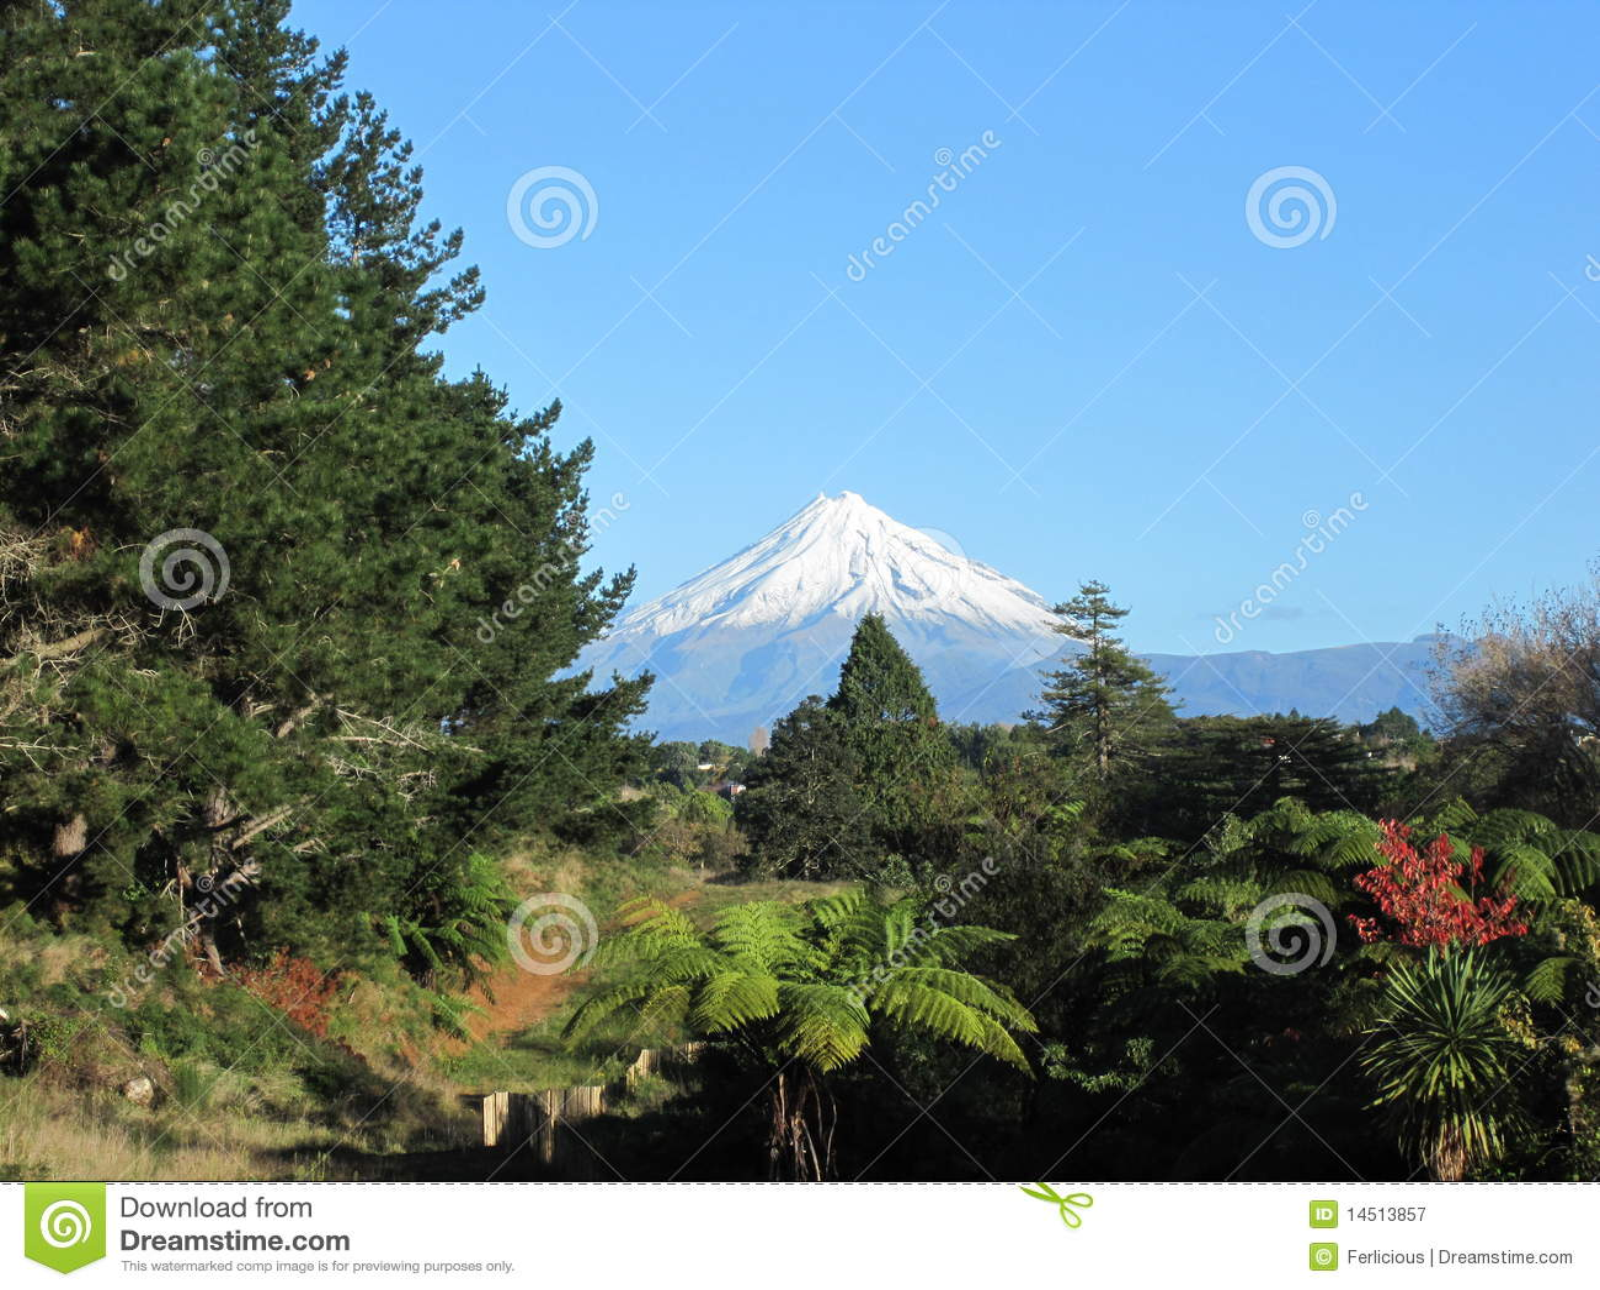 Mount Taranaki New Zealand  City pictures : Mount Taranaki, New Zealand Royalty Free Stock Photography Image ...